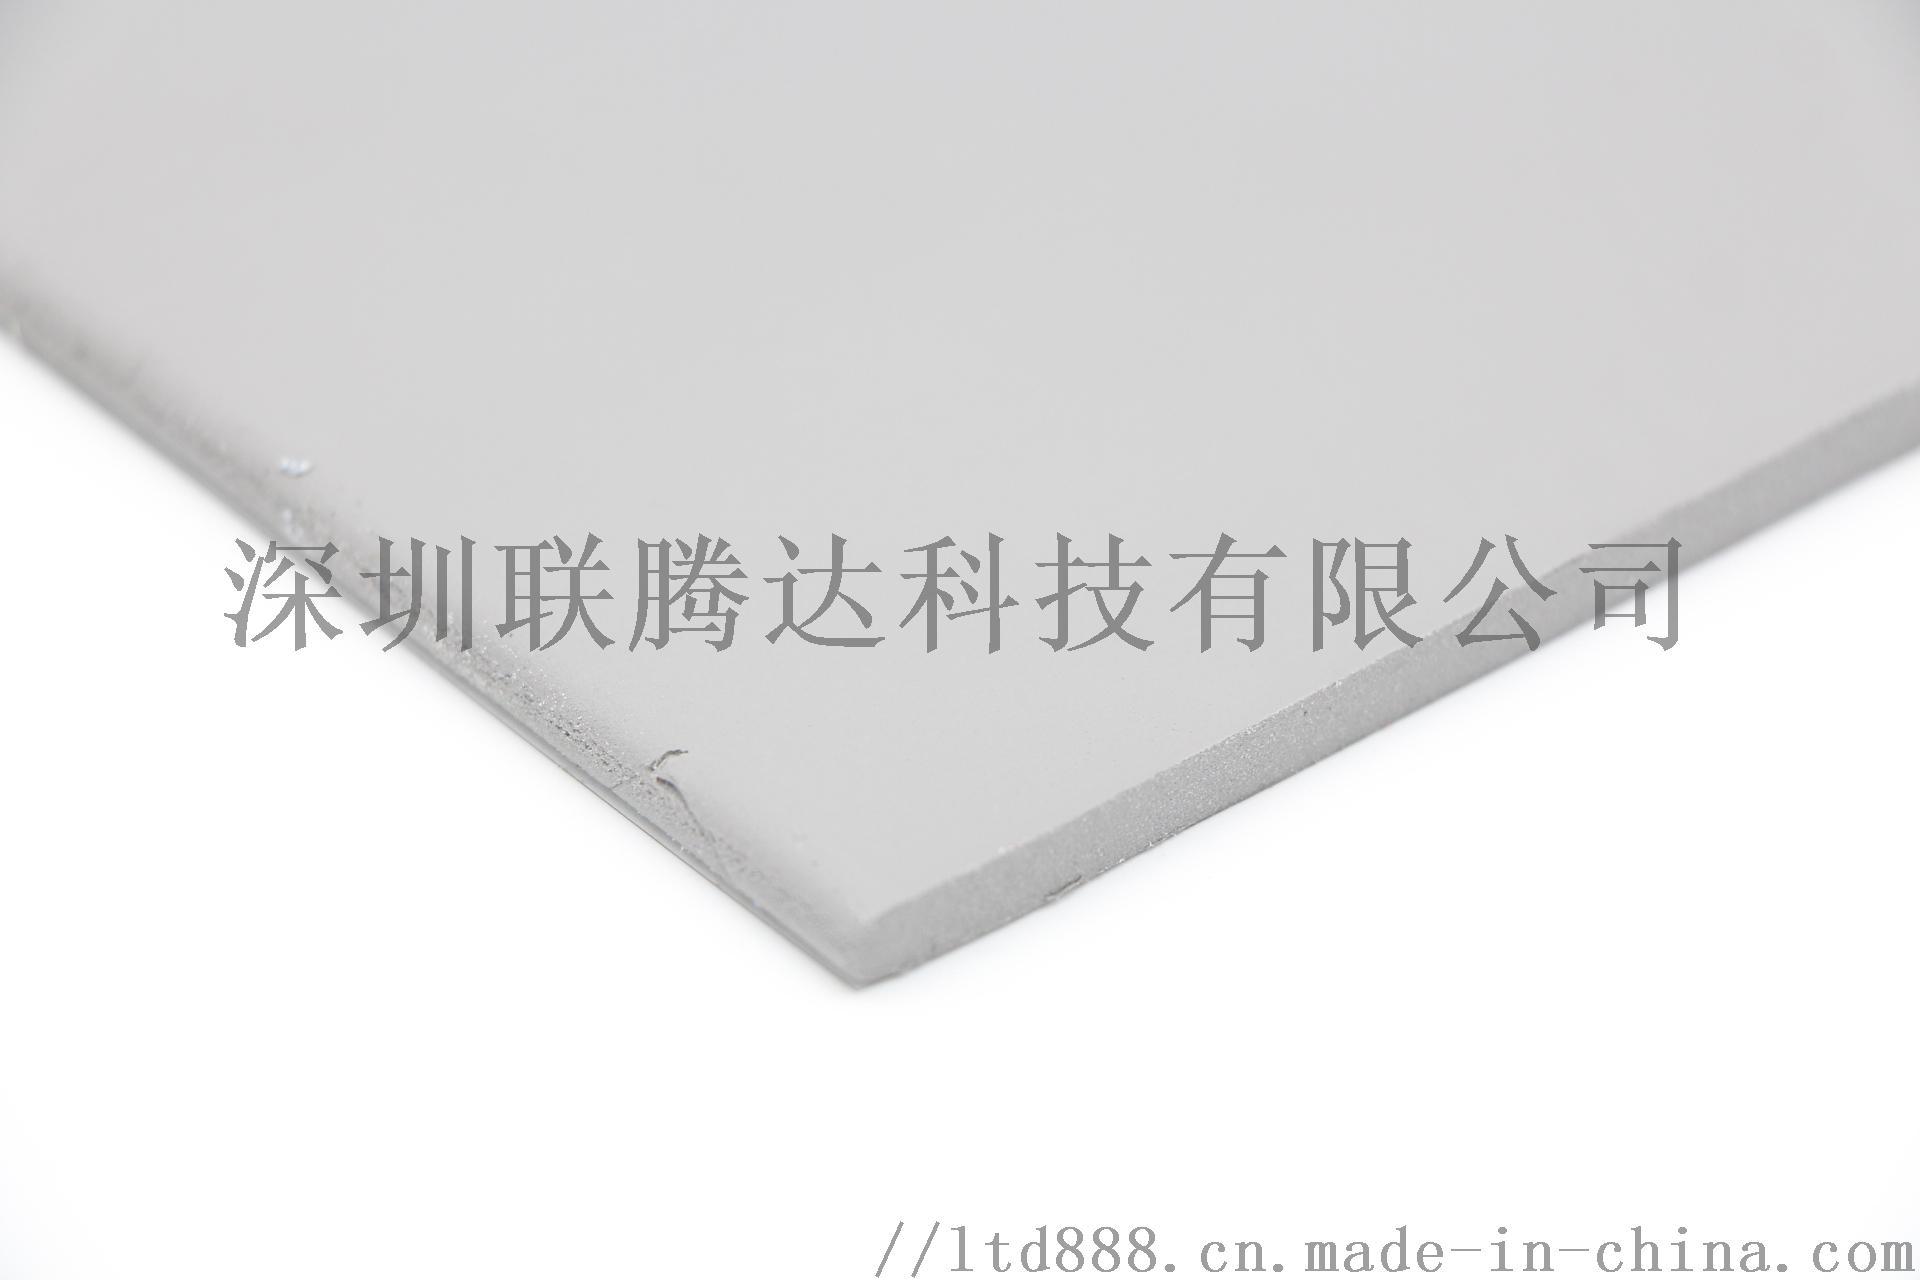 IMG_1919.JPG